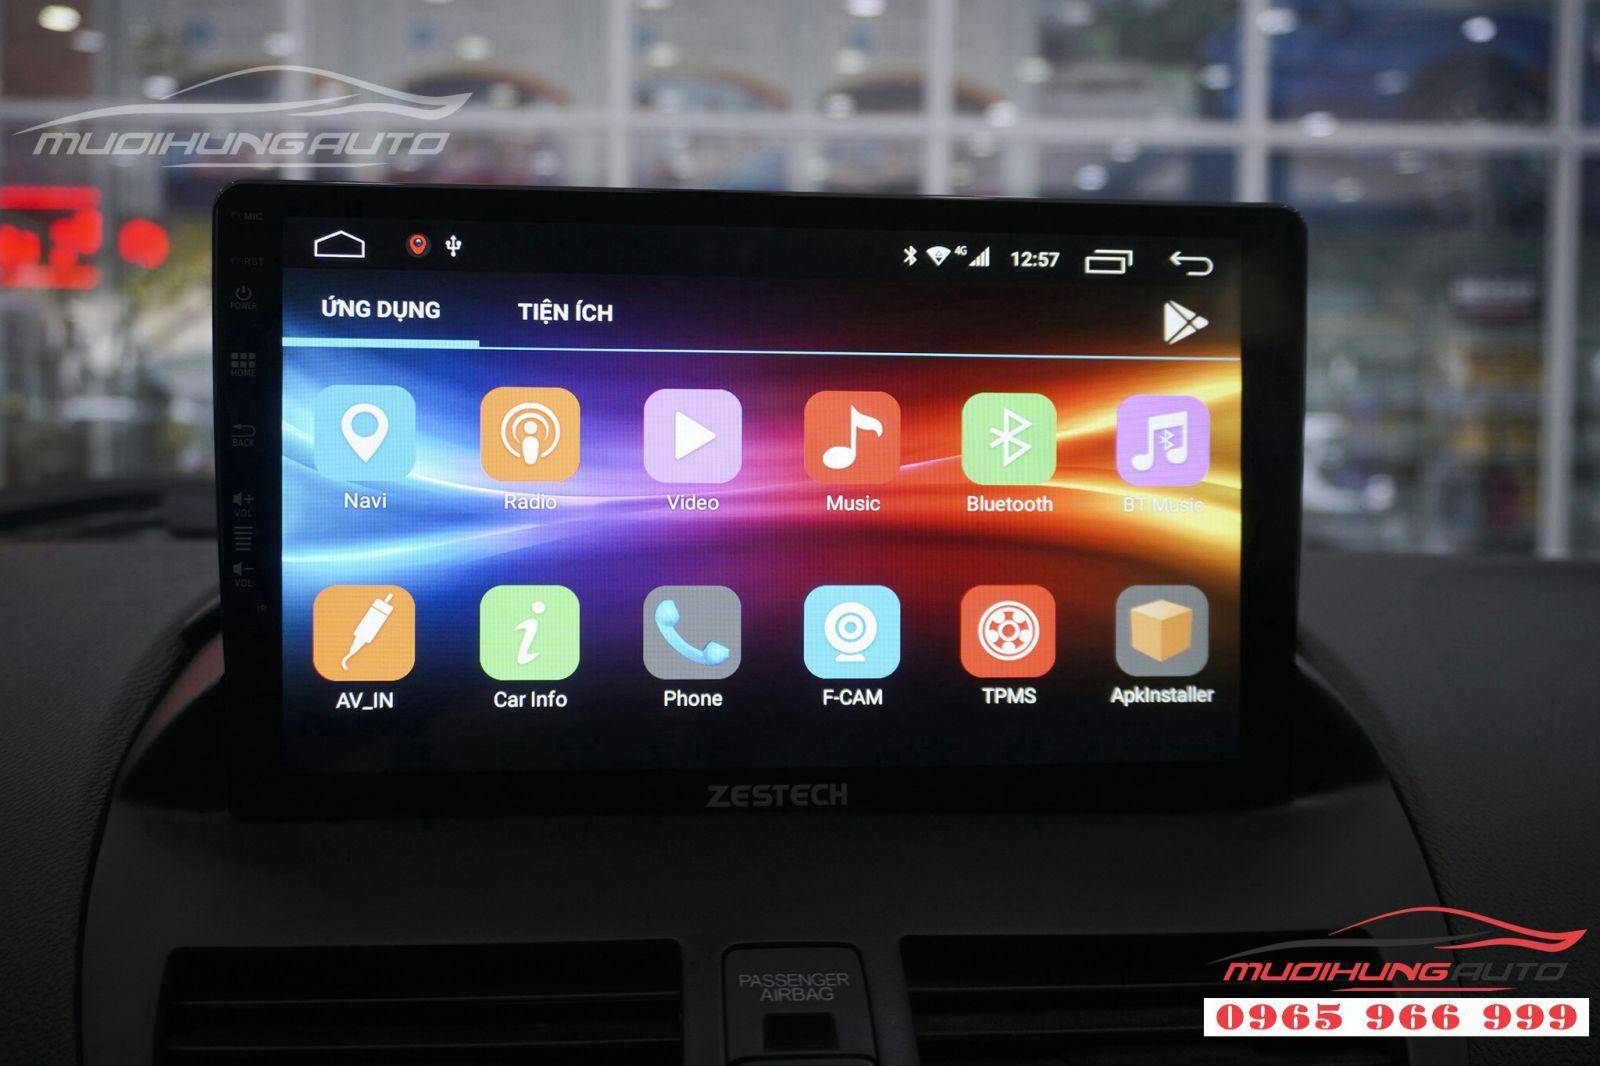 Lắp DVD Zestech Z500 chính hãng cho Acura 03